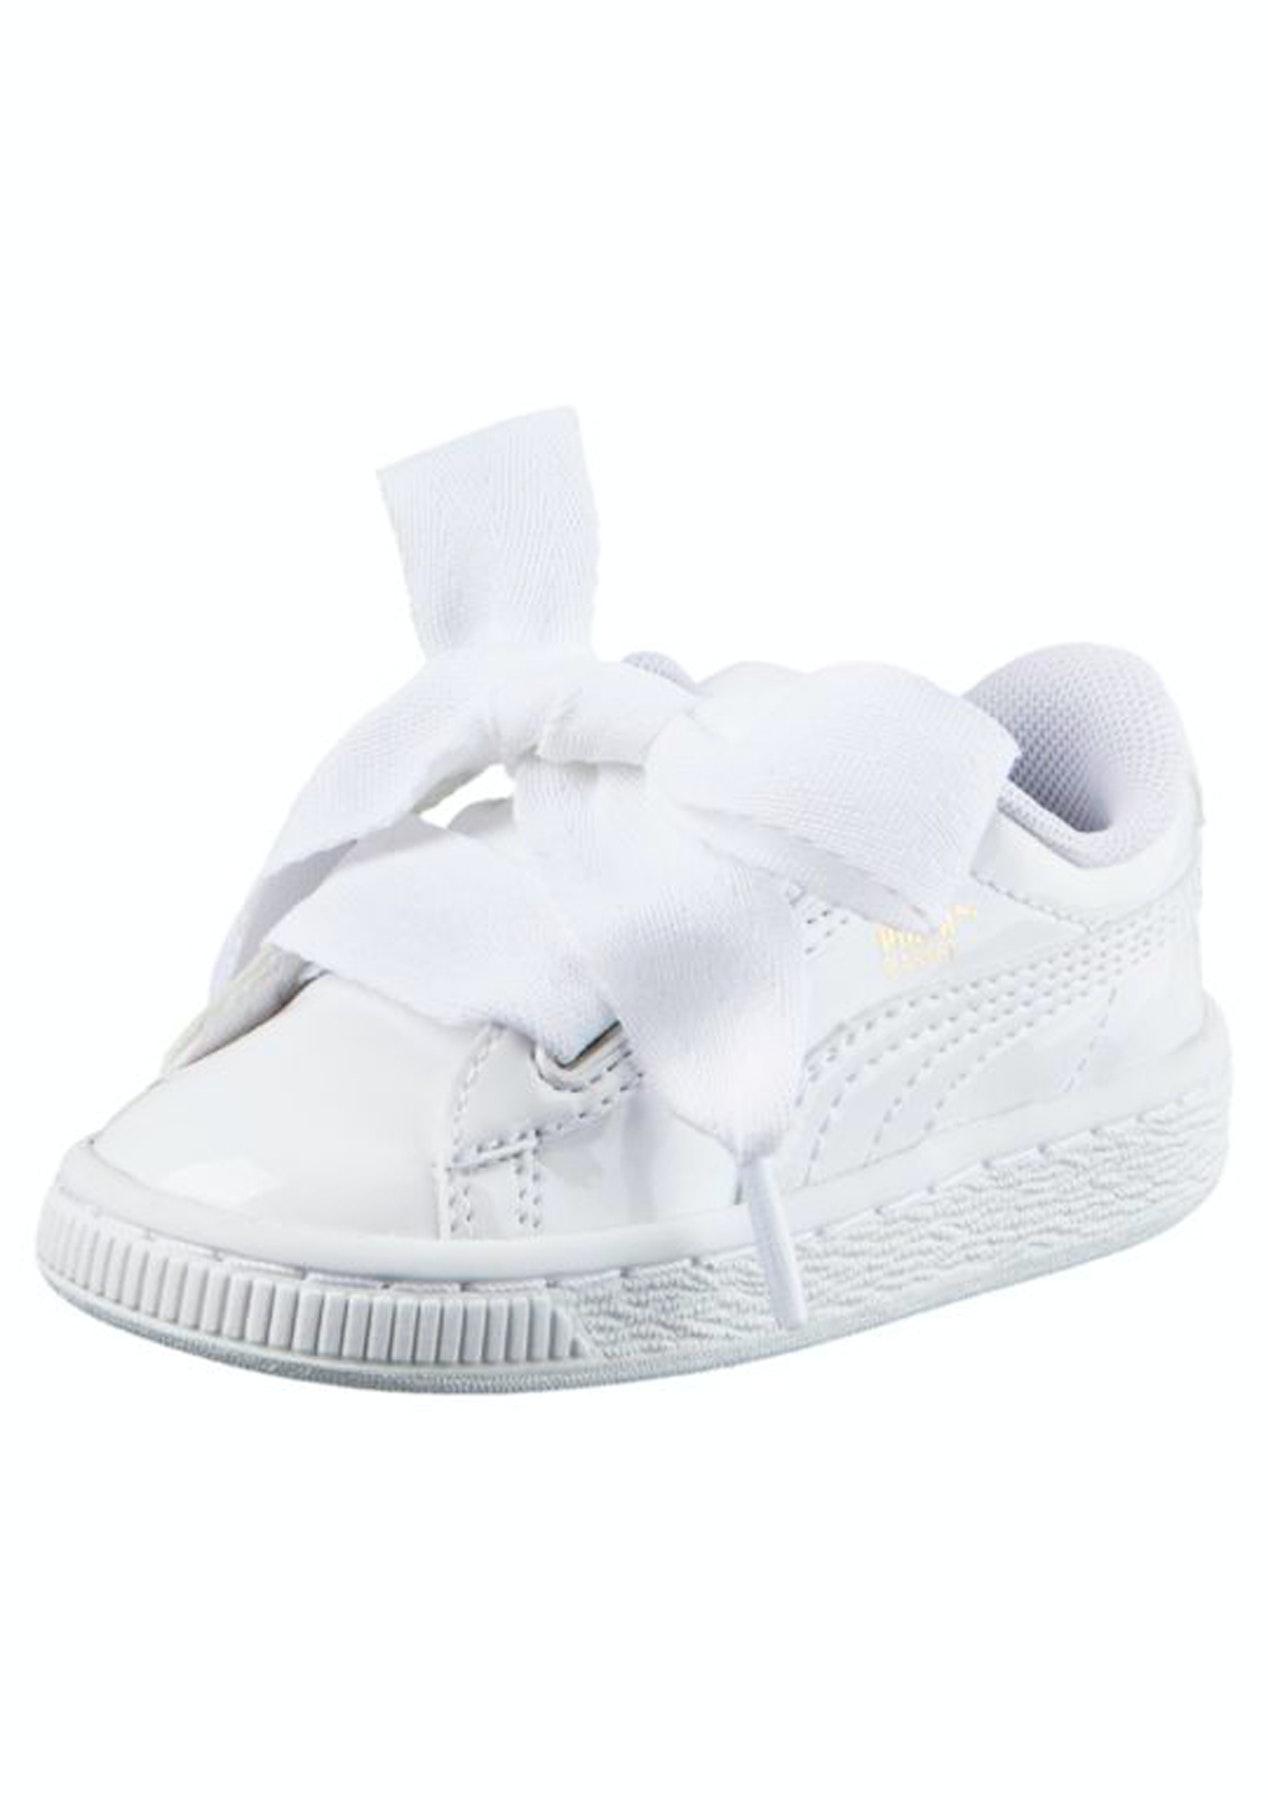 5a27644f3fc1 Puma Kids - Basket Heart Patent - White - PUMA Womens   Kids - Onceit